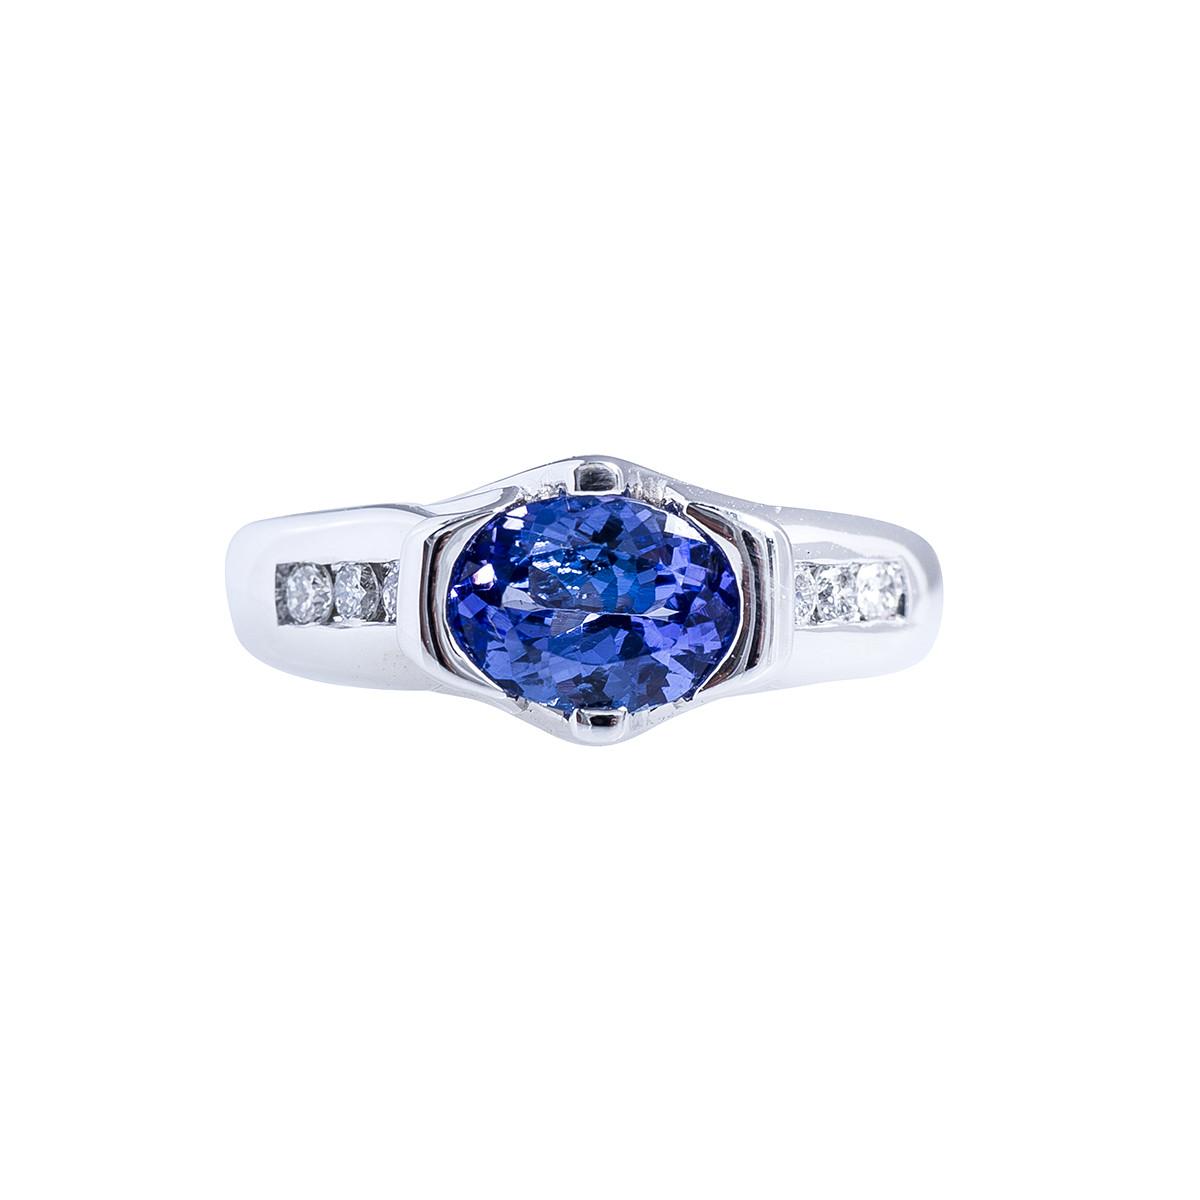 Vintage Levian 1.25 CTW Tanzanite & Diamond Ring